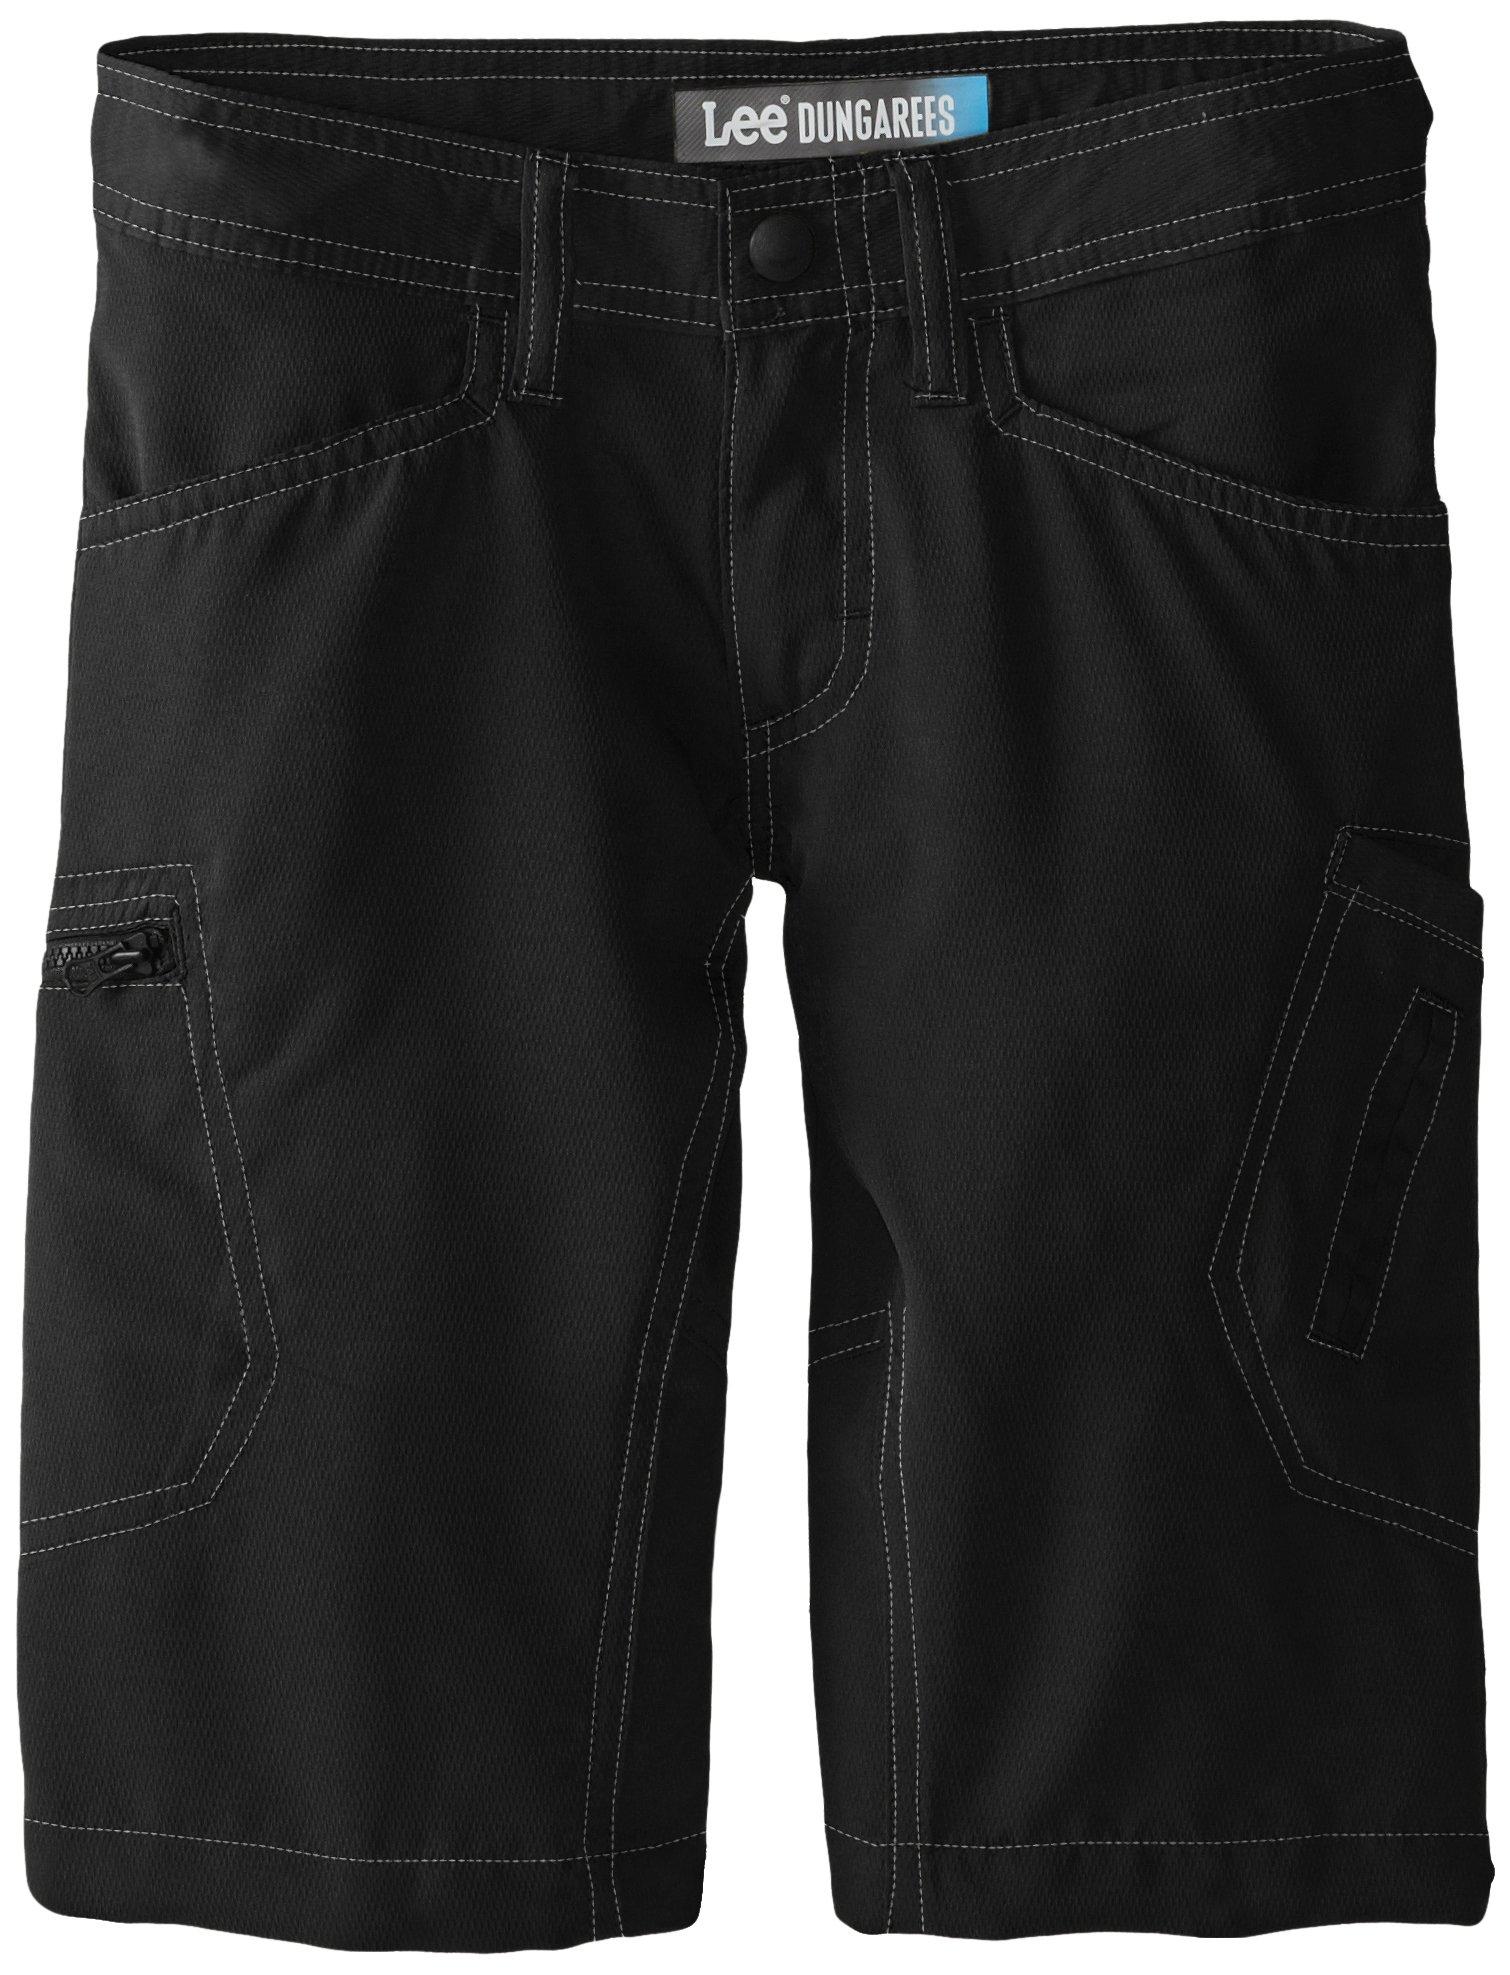 Lee Big Boys' Dungarees Grafton Cargo Short, Black, 10